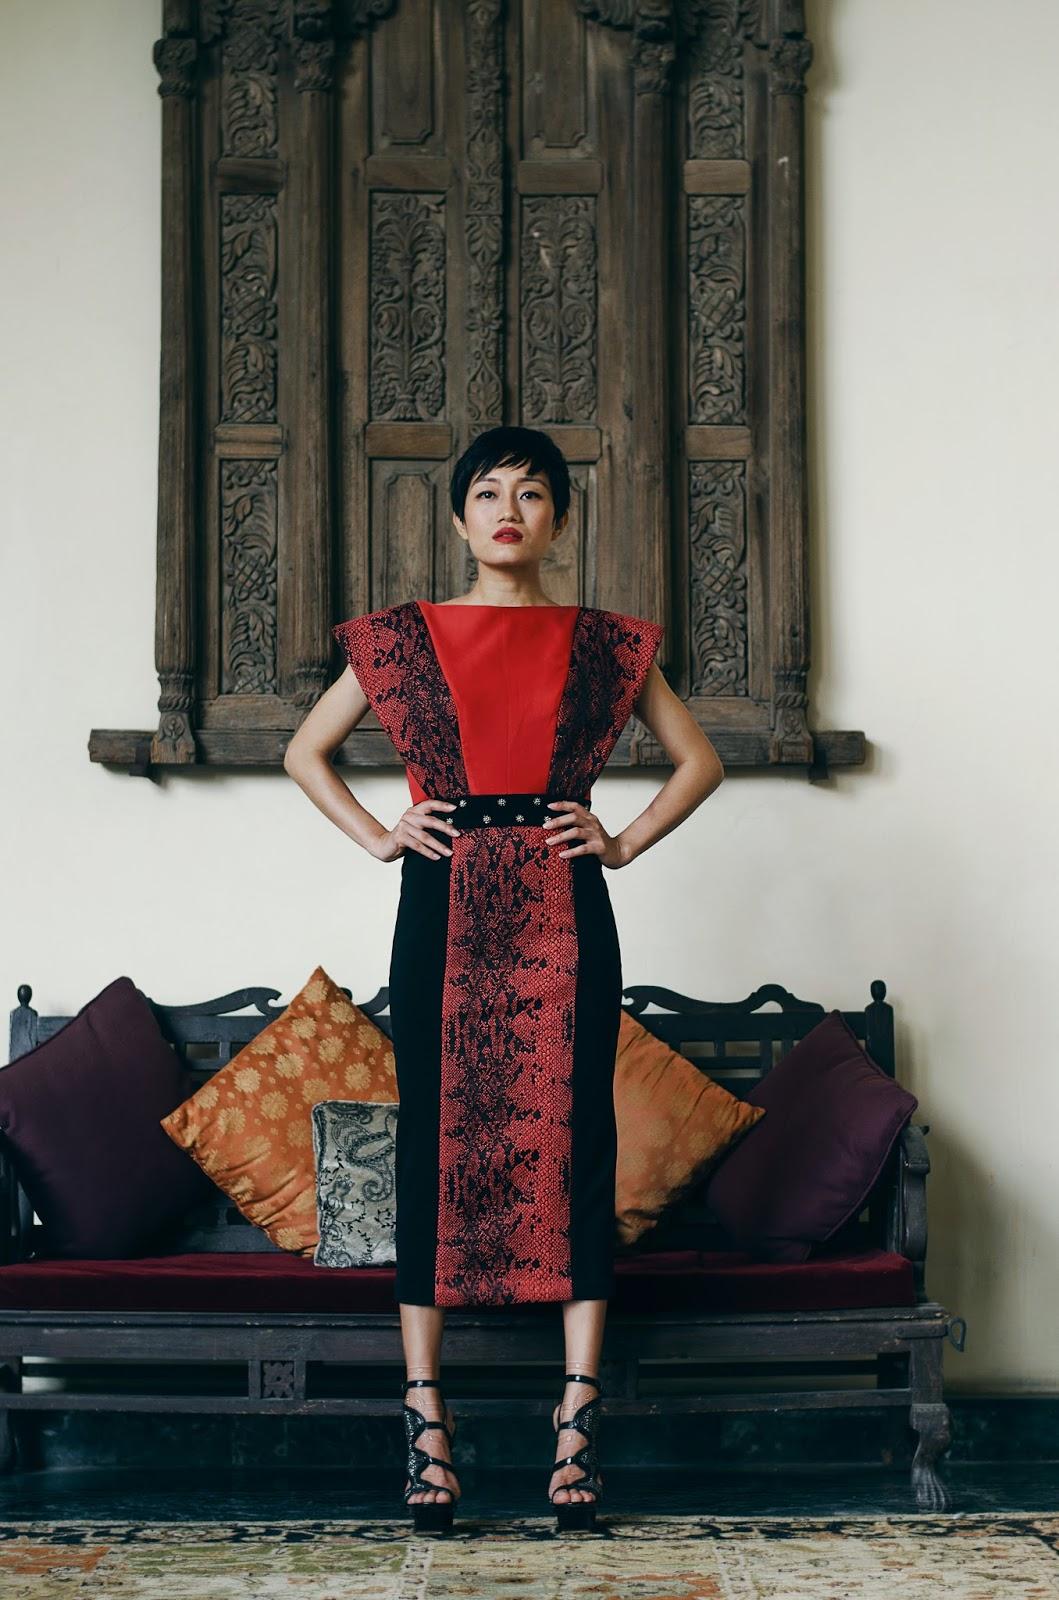 MANIKA NANDA, Monet-esque, sci-fi character, Effie Trinket, dark, broody, edgy, sexy, Shaharpur Jat, Designers, Indian Designers, floral magnetism, dark romance